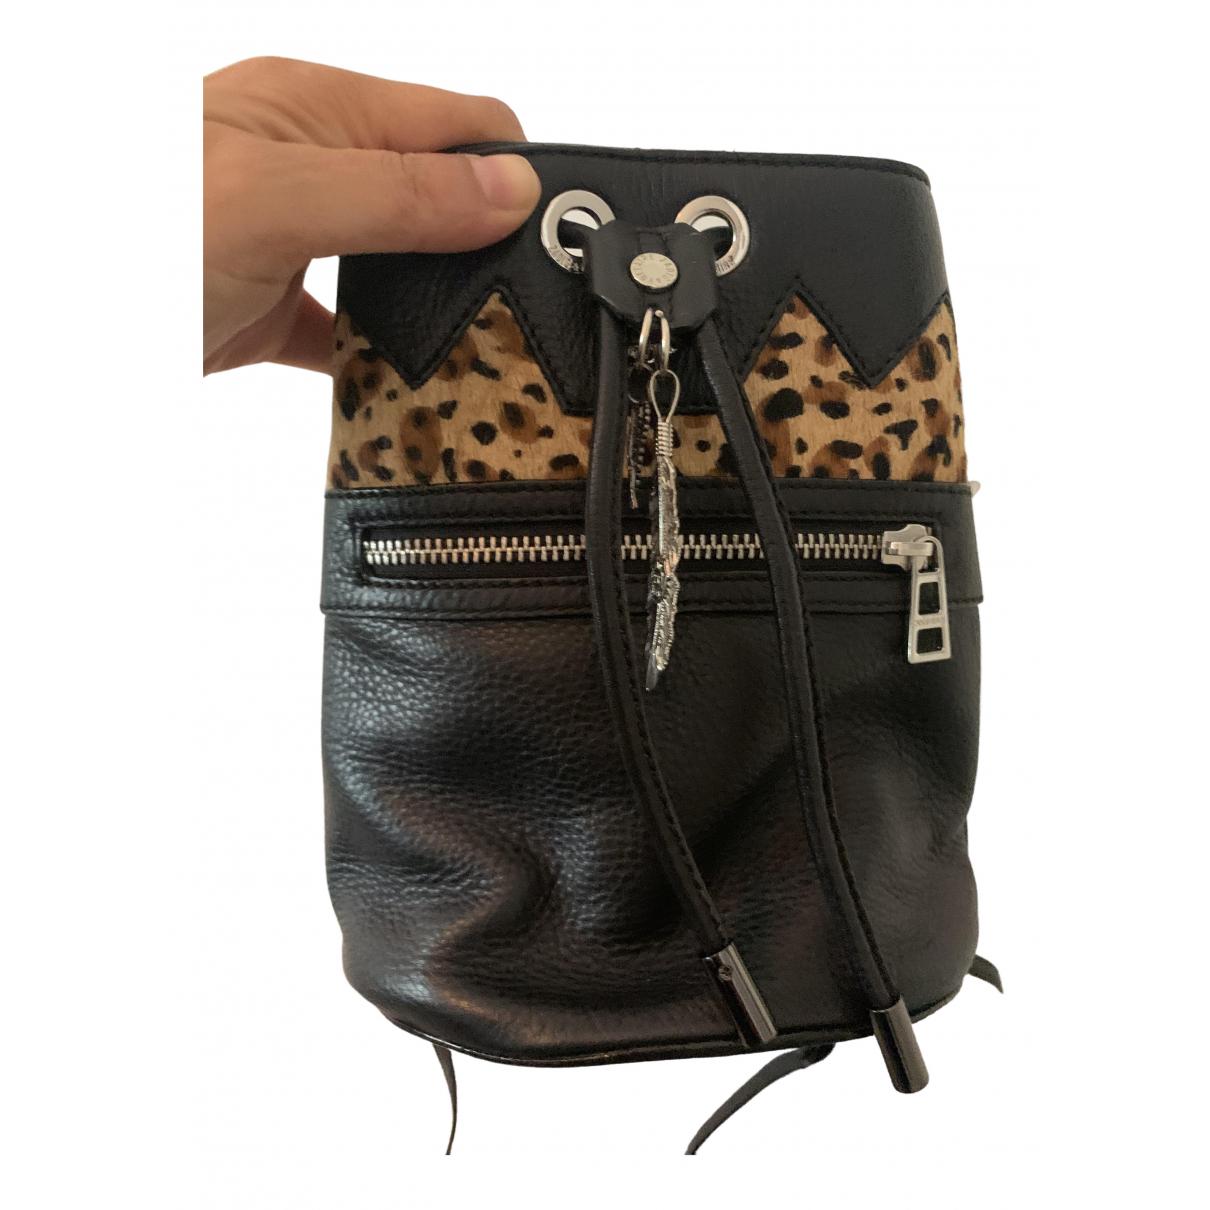 Zadig & Voltaire \N Black Leather handbag for Women \N